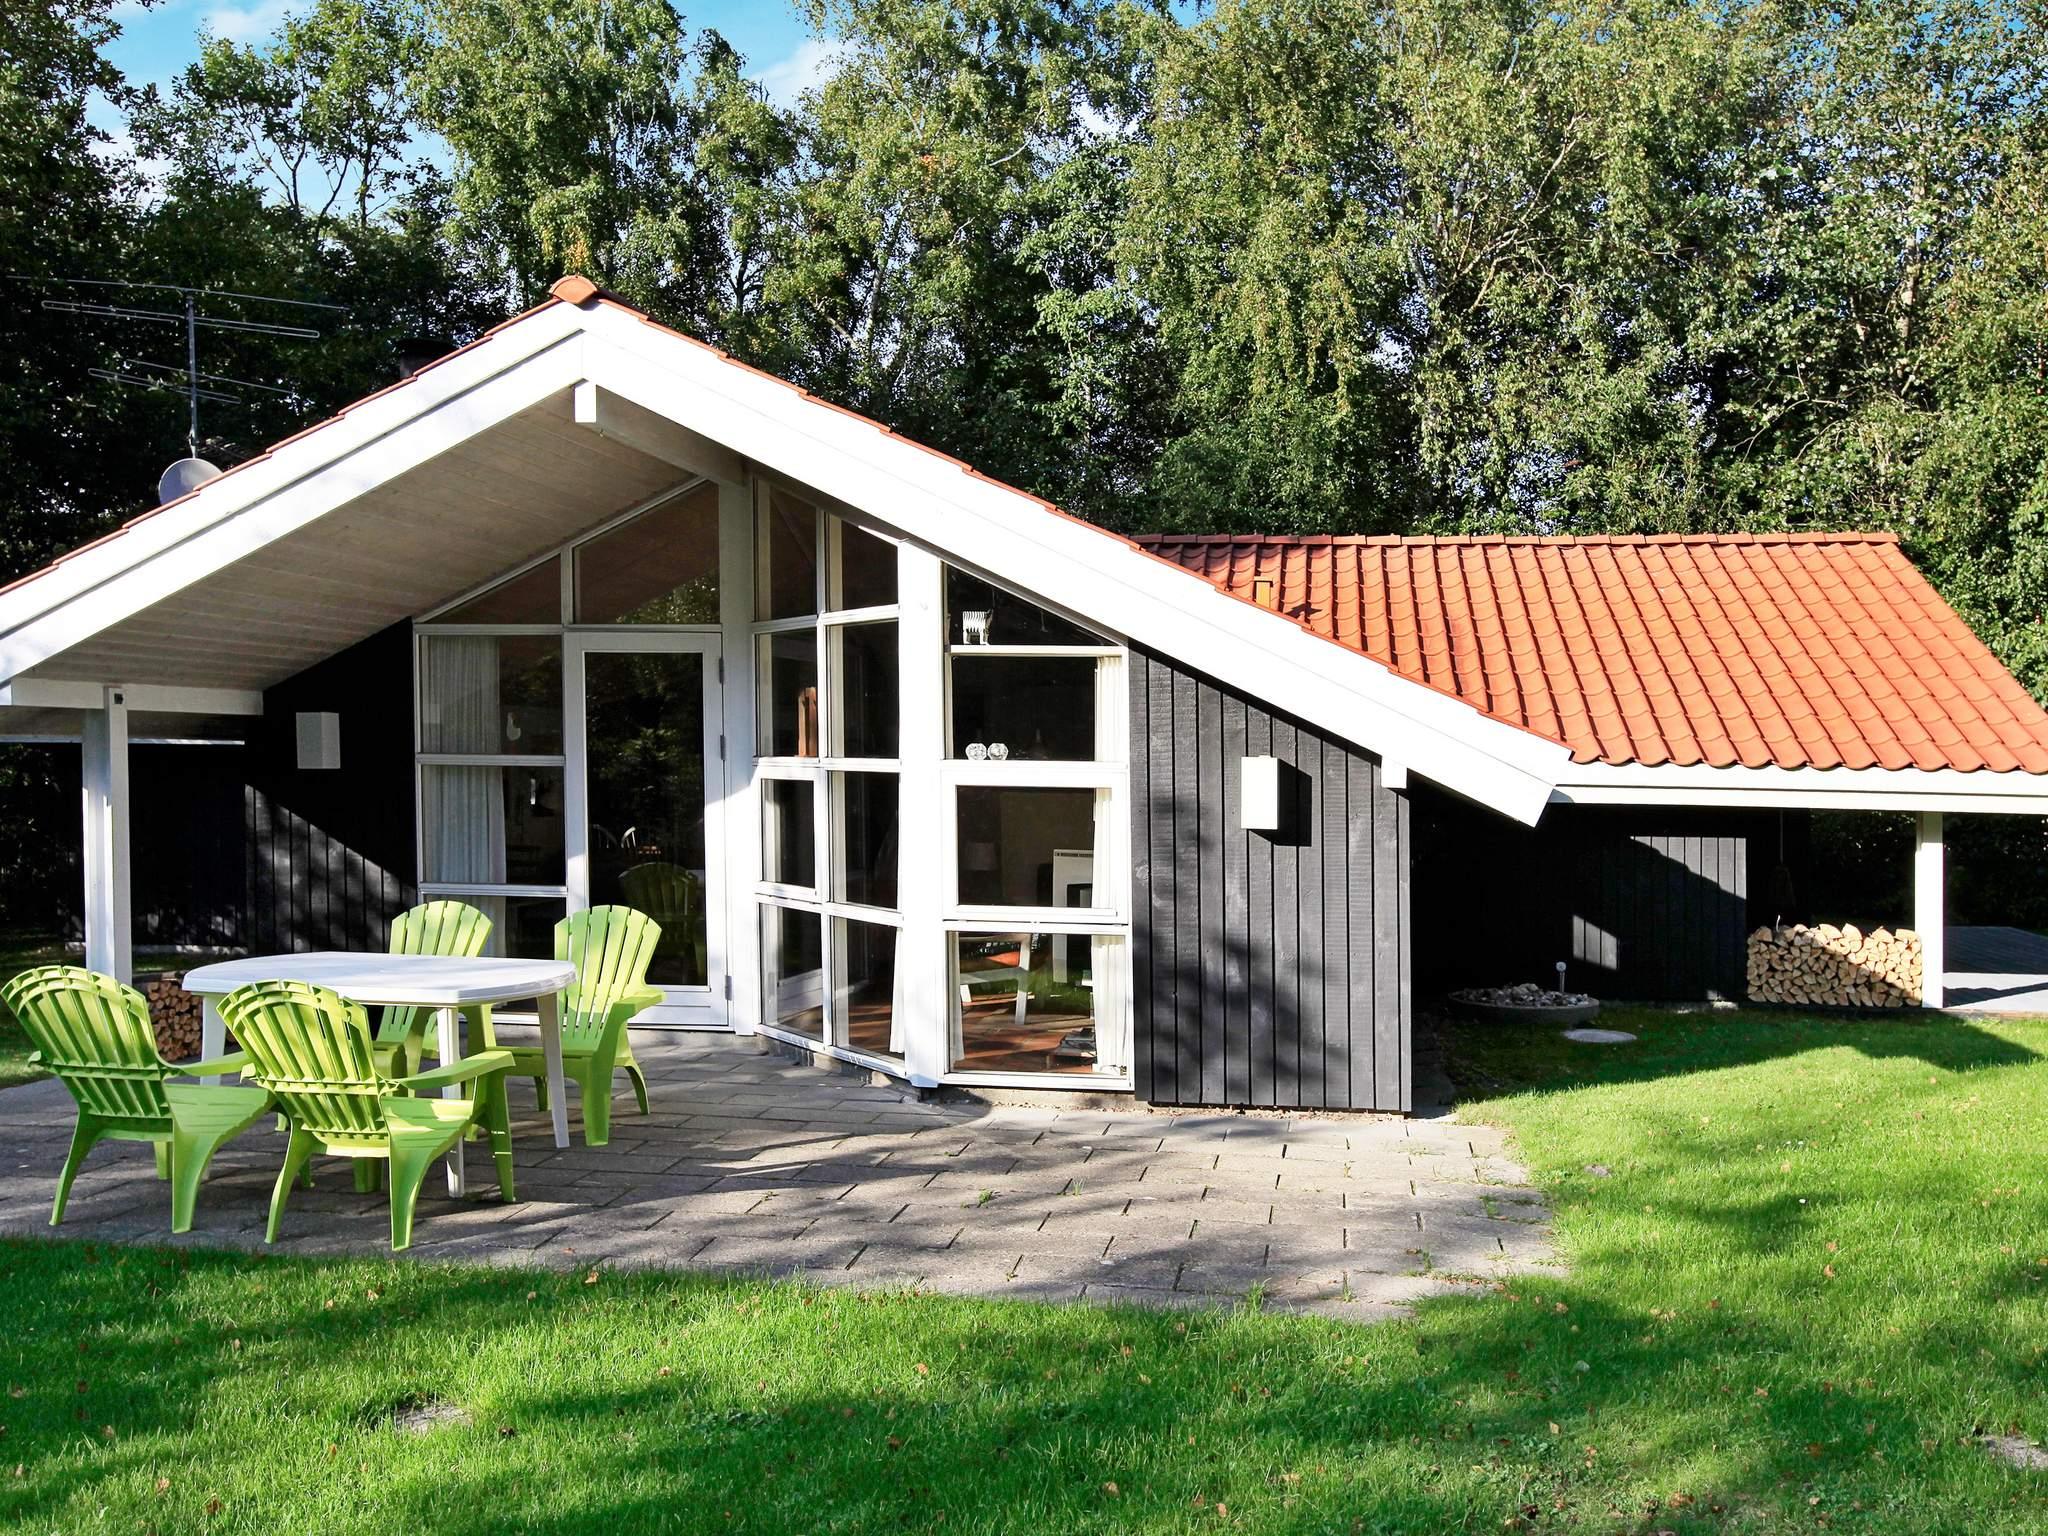 Ferienhaus Ristinge (160040), Ristinge, , Langeland, Dänemark, Bild 21